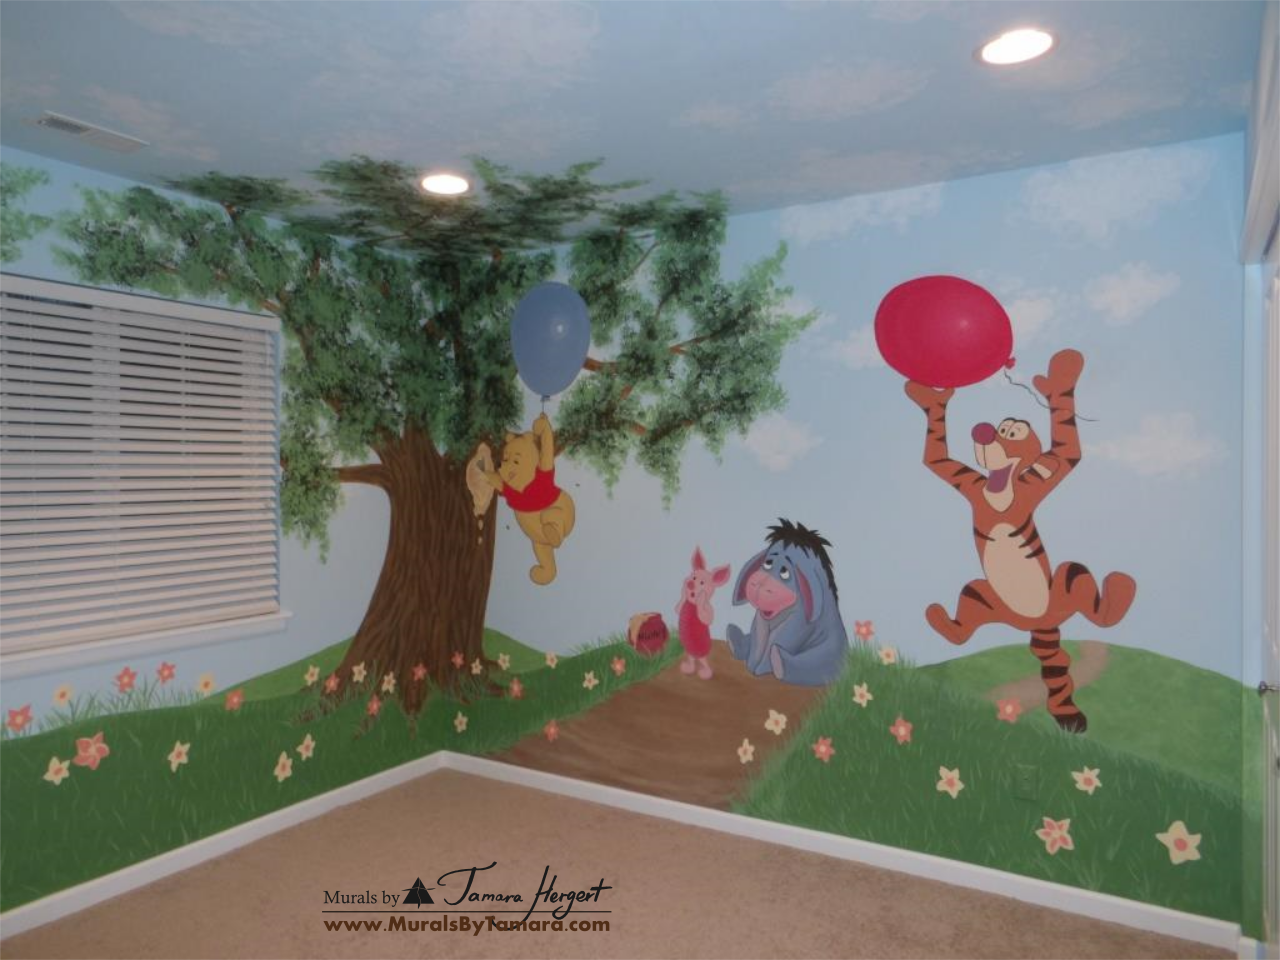 Winnie the Pooh mural right corner - kids room mural by Tamara Hergert